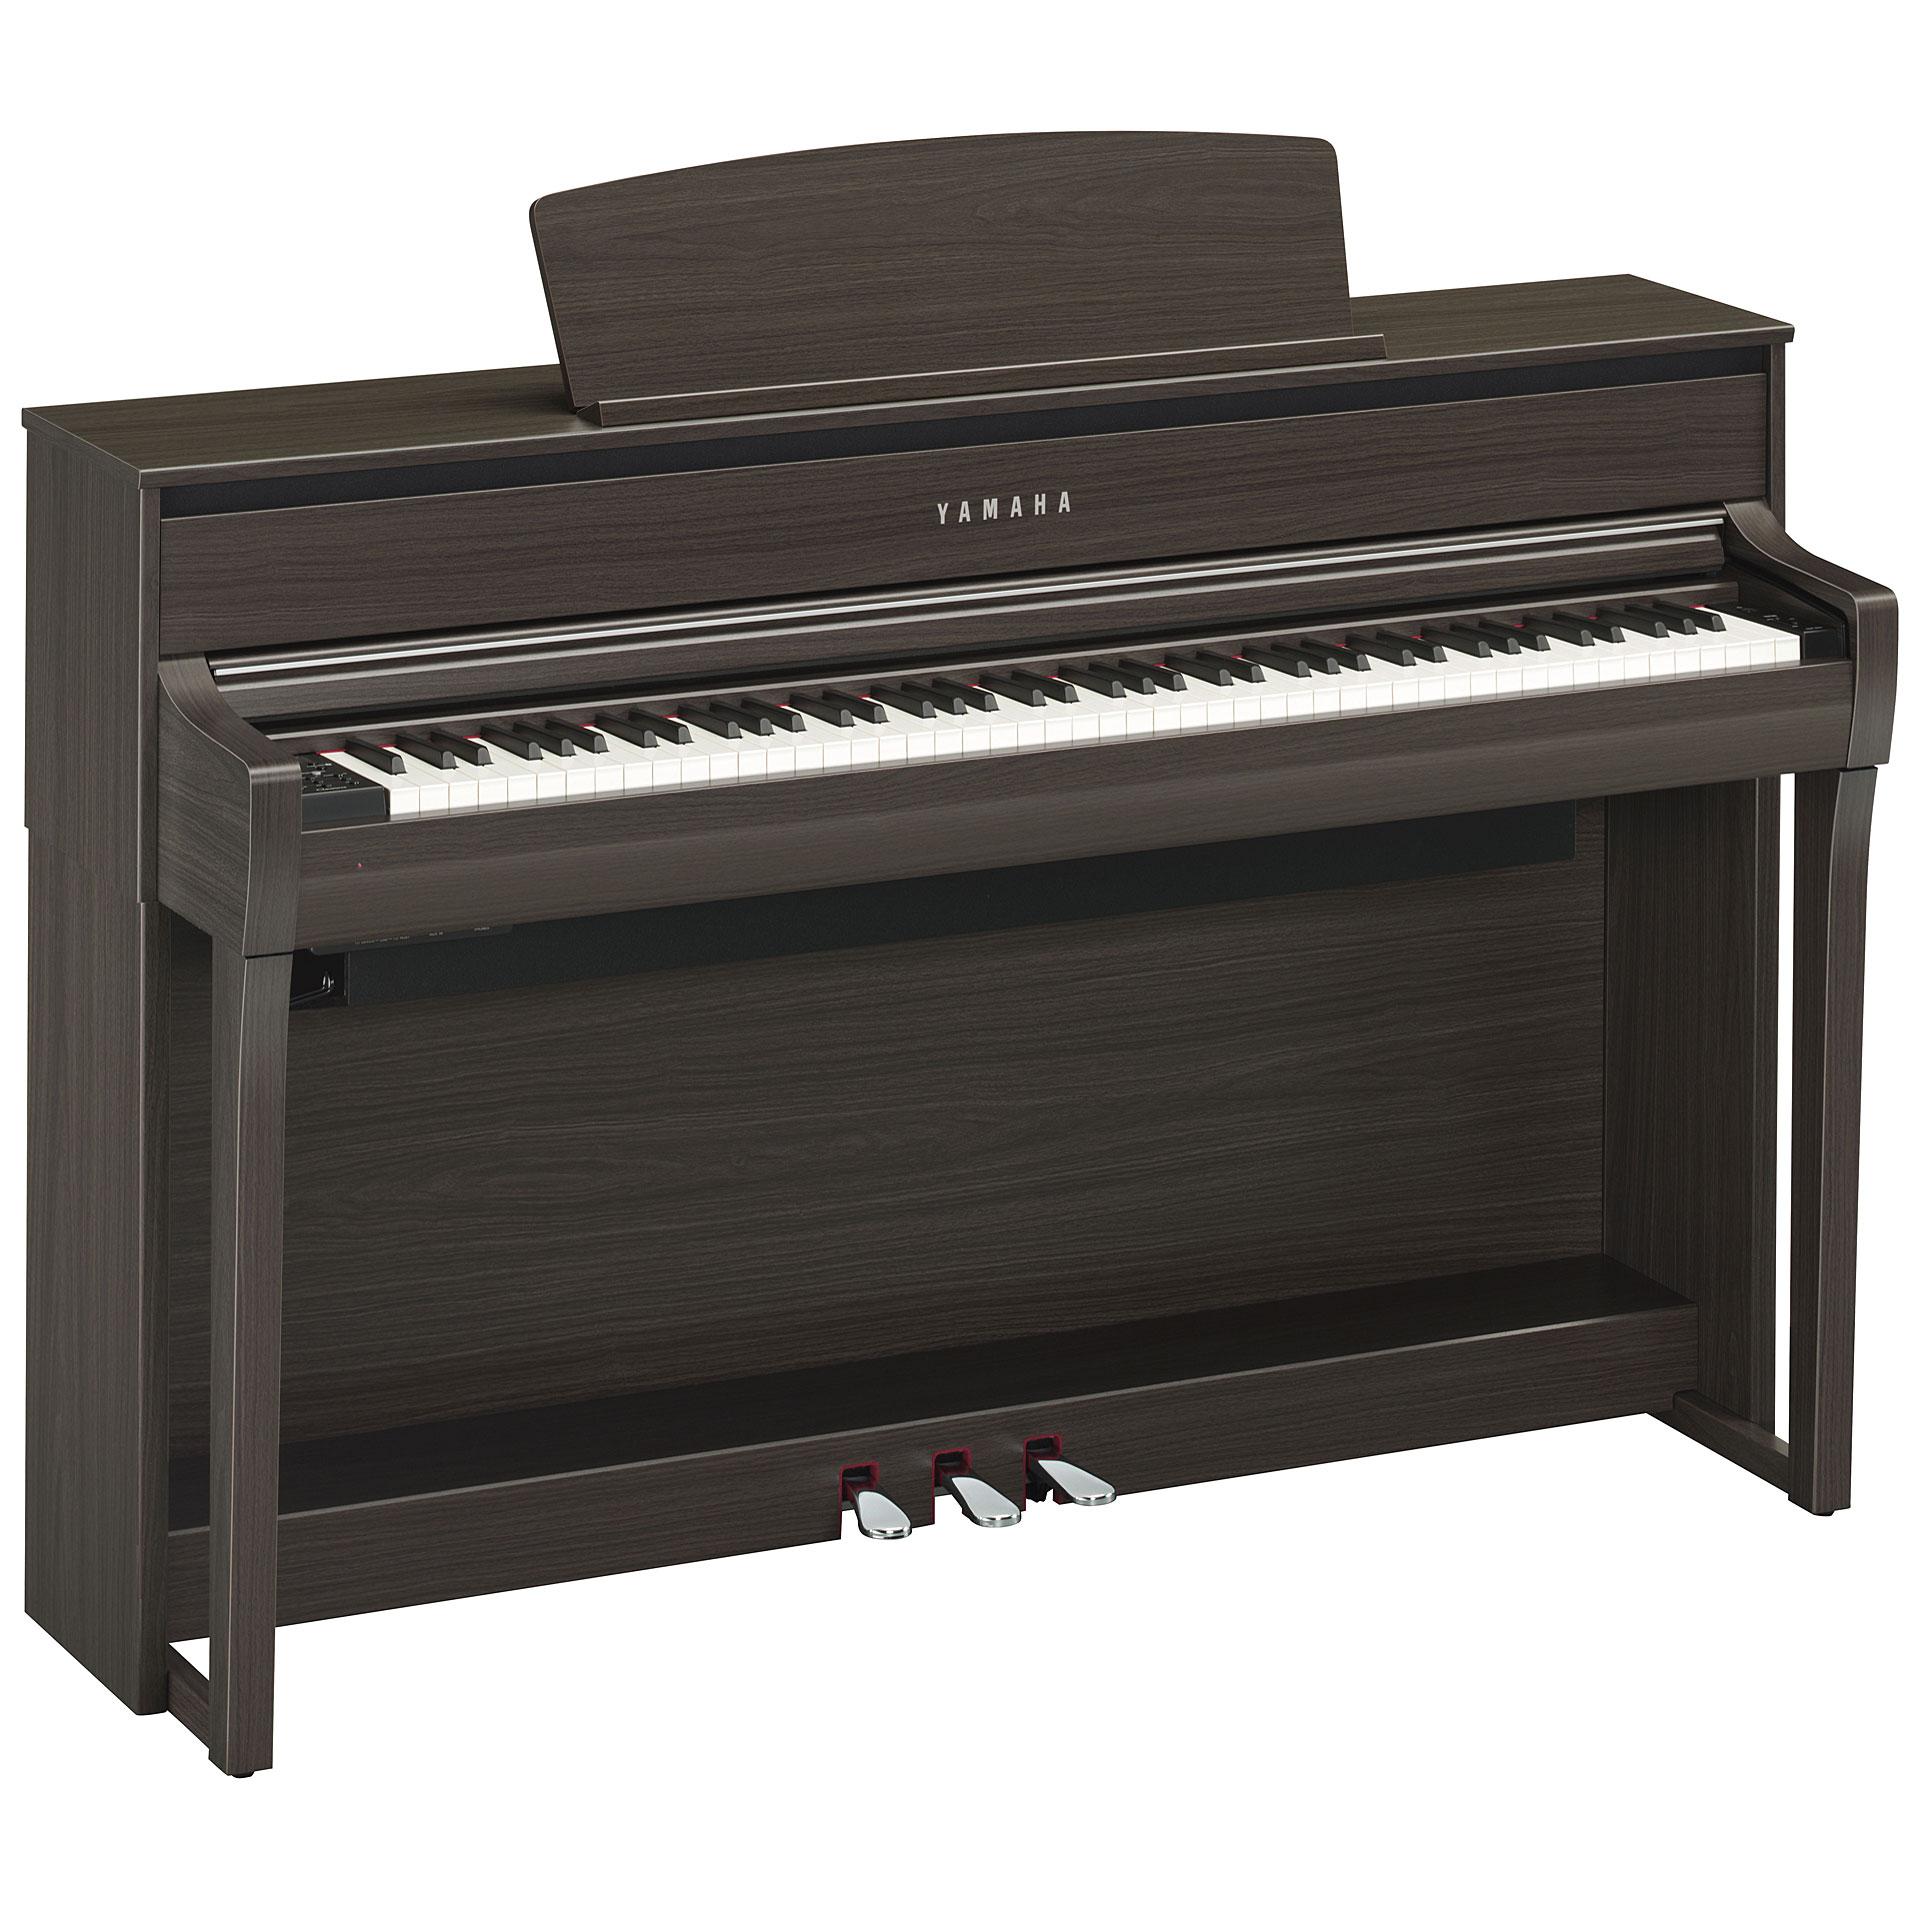 yamaha clavinova clp 675dw digital piano. Black Bedroom Furniture Sets. Home Design Ideas